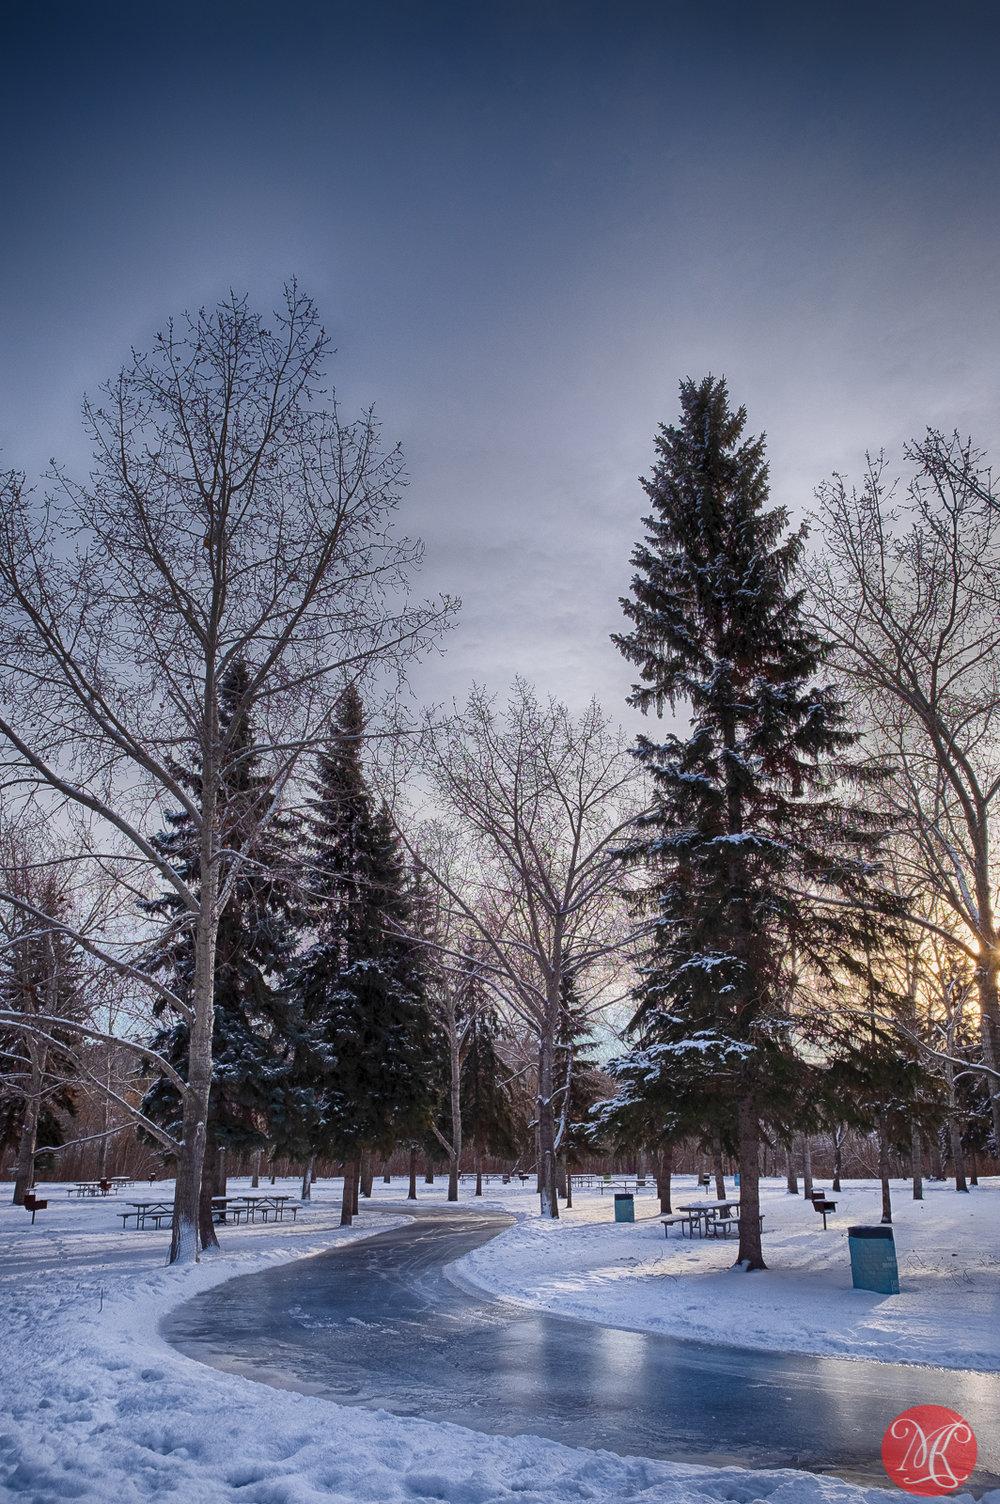 Morning at the park 5